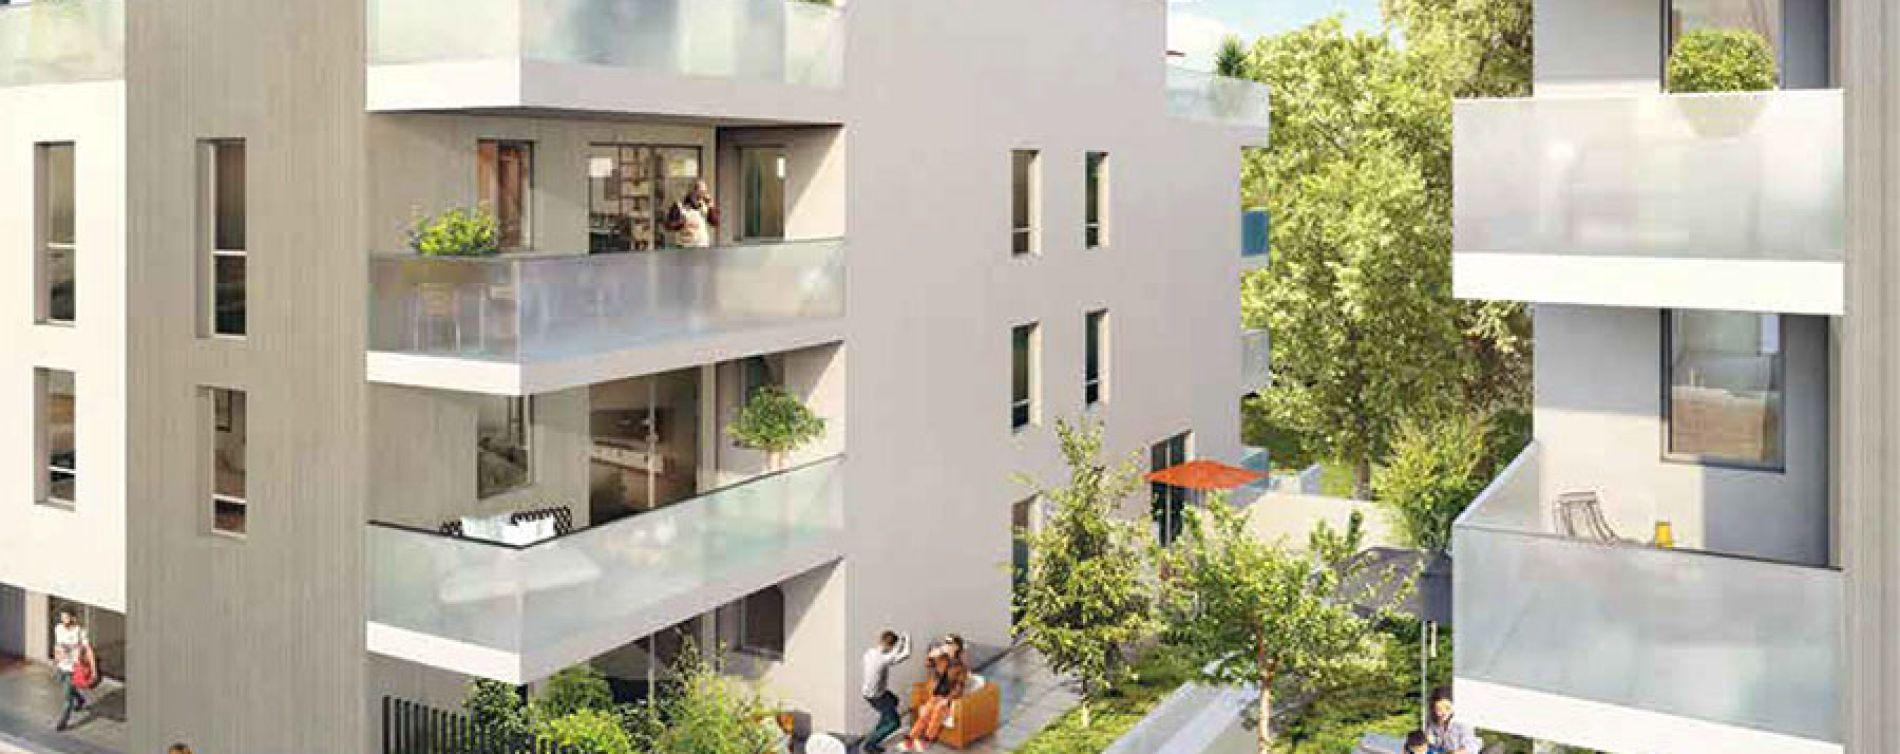 Irigny : programme immobilier neuve « Monts Village » (2)